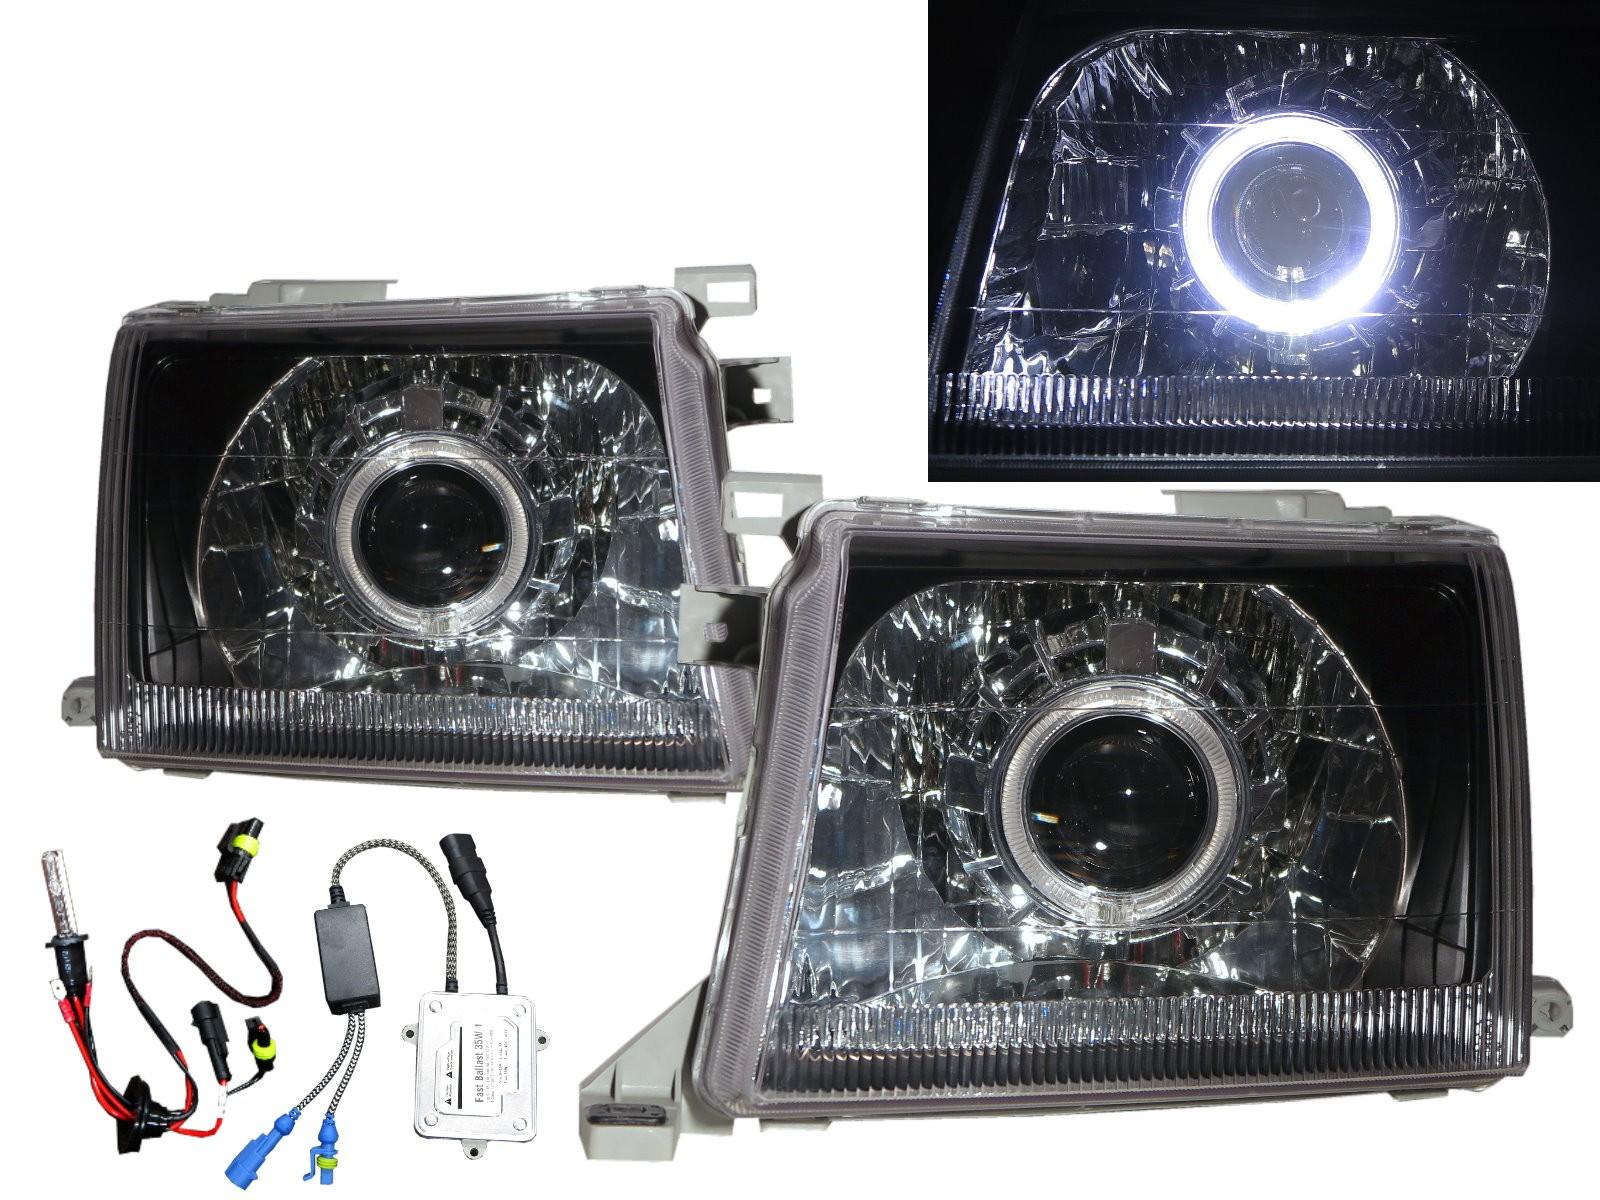 CrazyTheGod Winner D22 First generation 2000-2001 Facelift Truck 2D/4D Guide LED Angel-Eye Projector HID Headlight Headlamp Black for NISSAN RHD